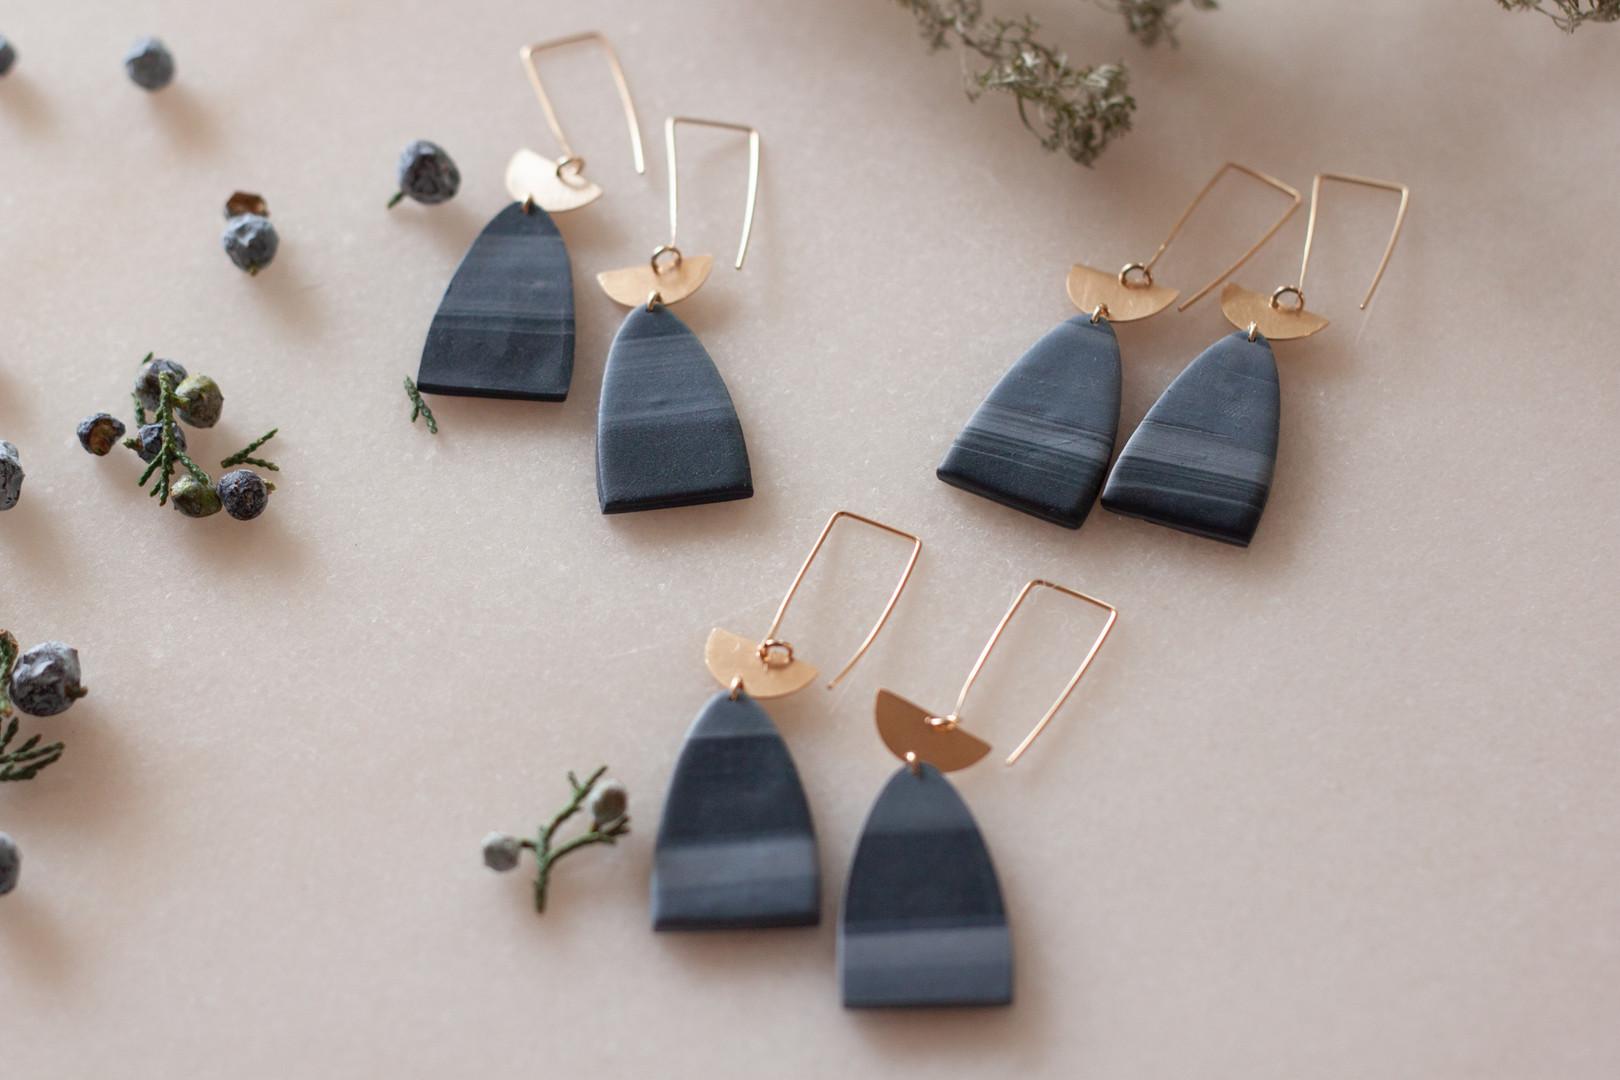 One-of-a-kind earrings